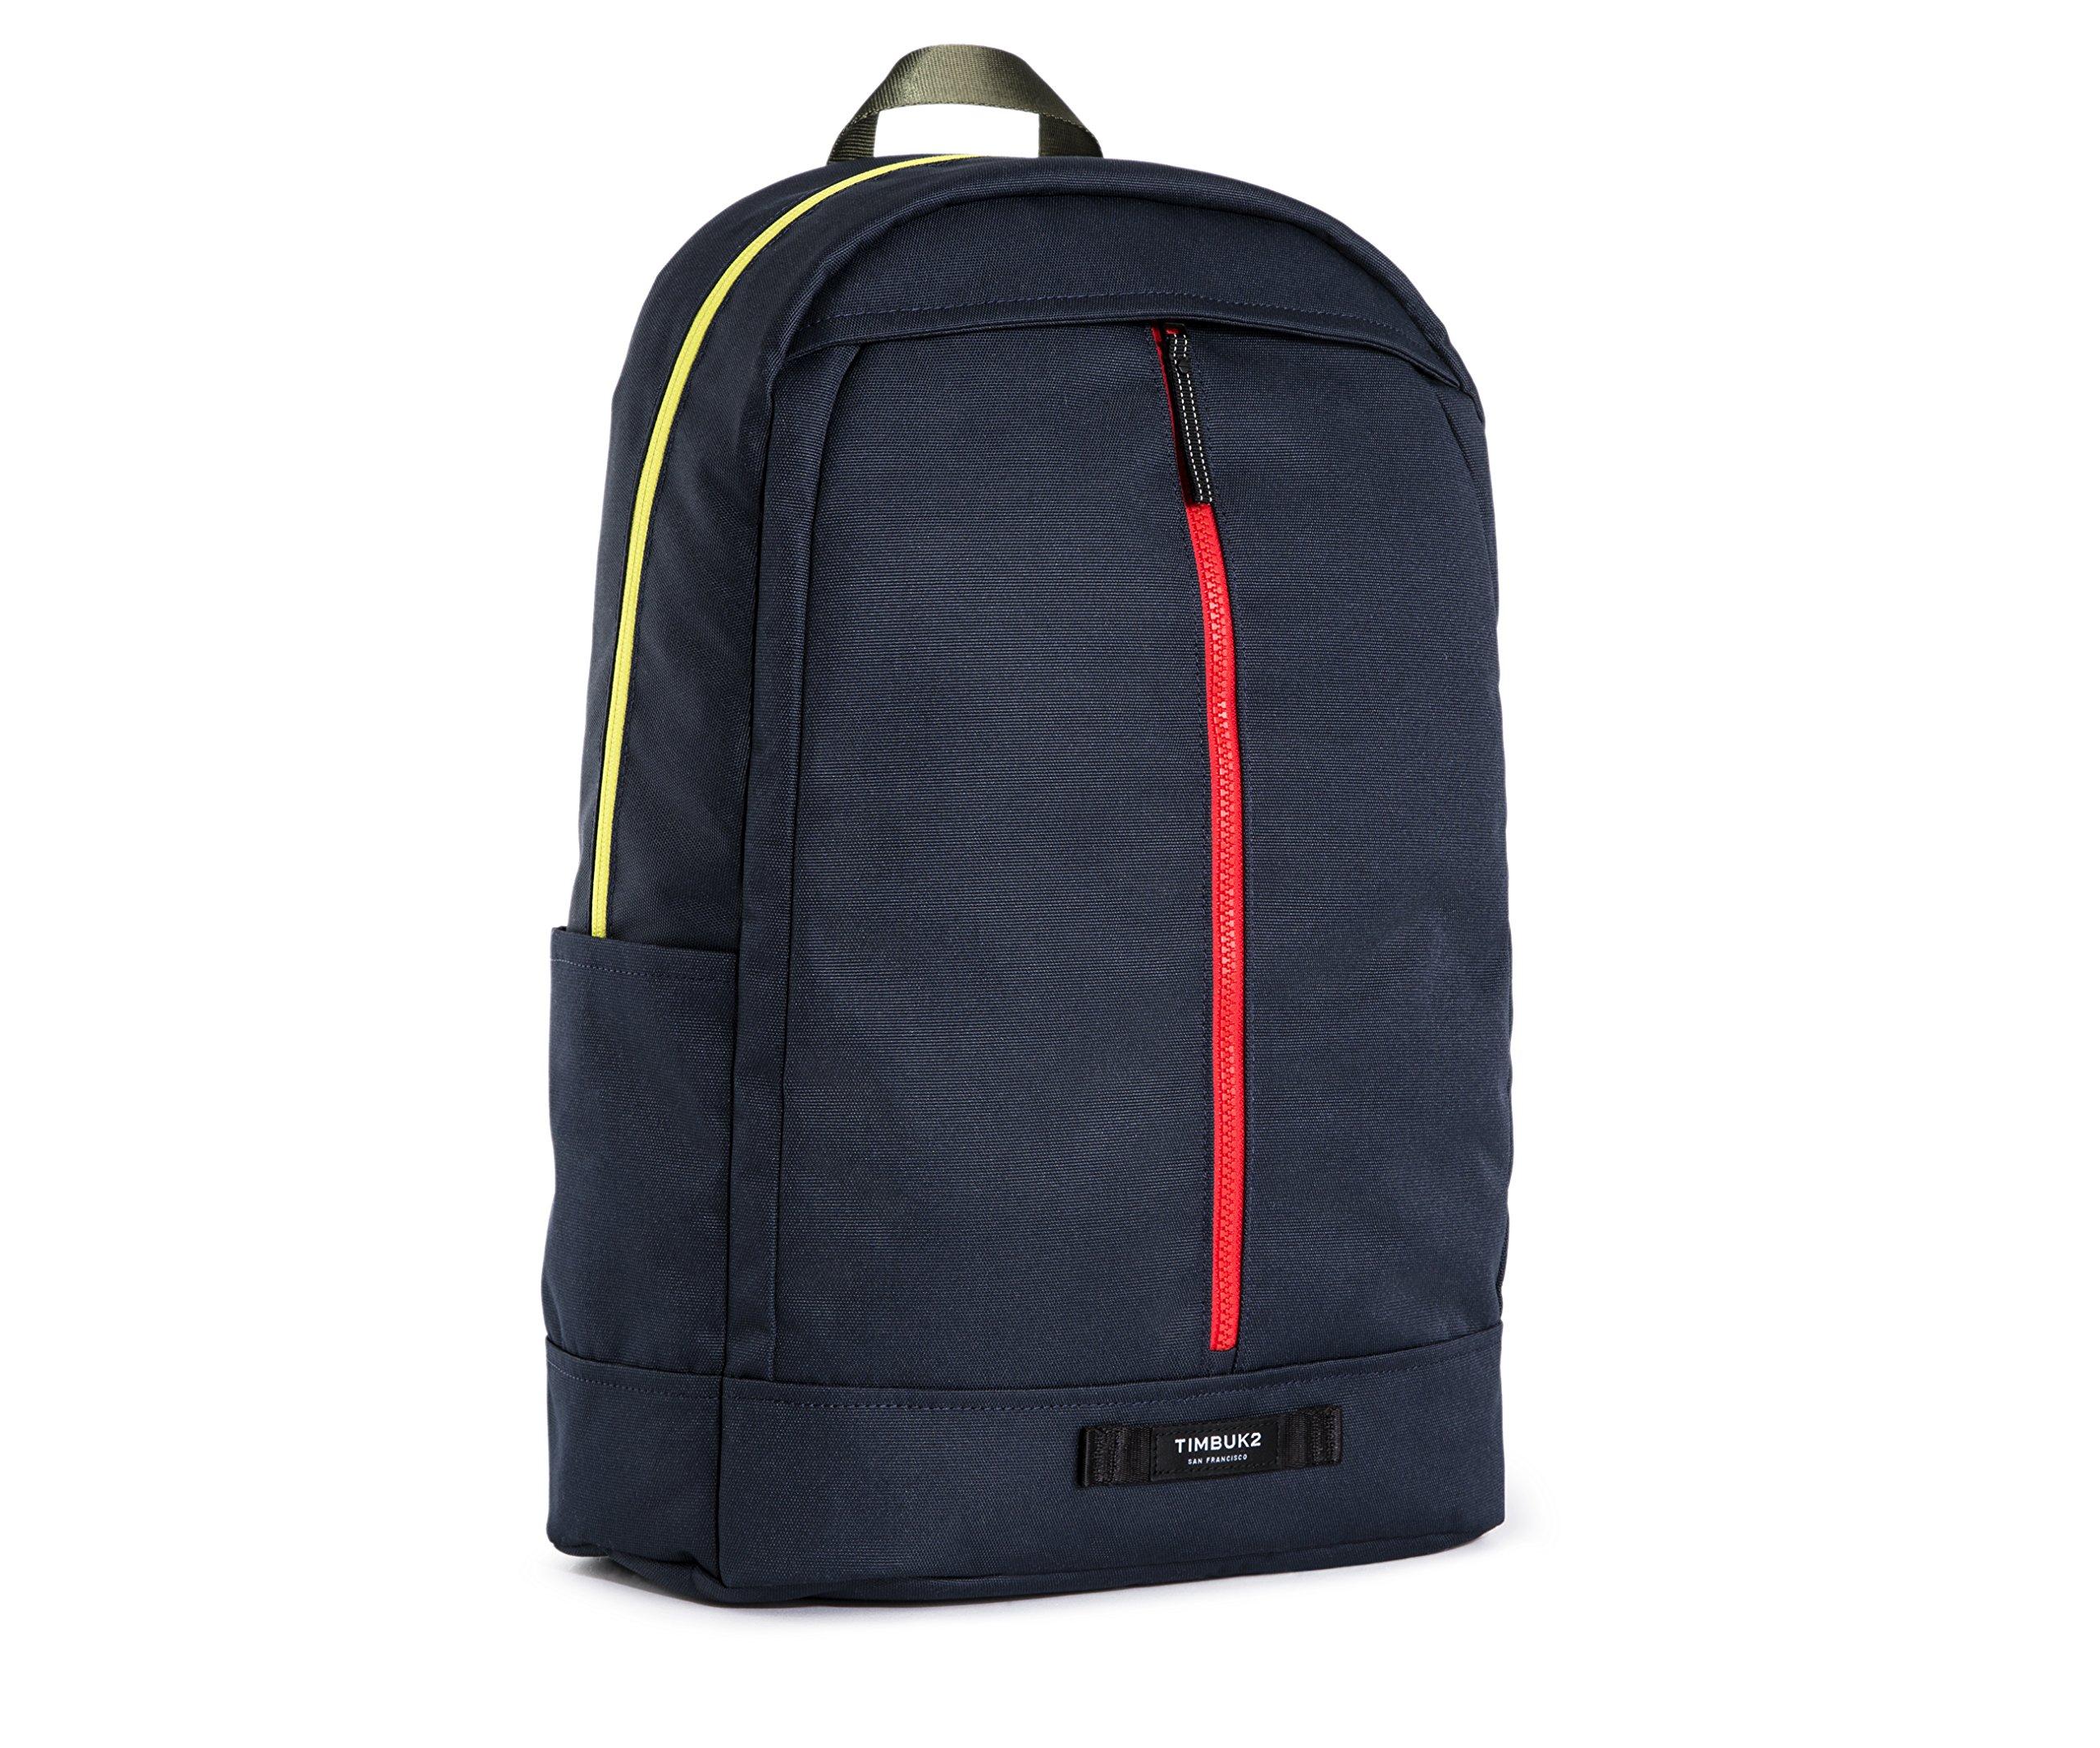 Timbuk2 Vault Backpack, Nautical/Bixi, Medium by Timbuk2